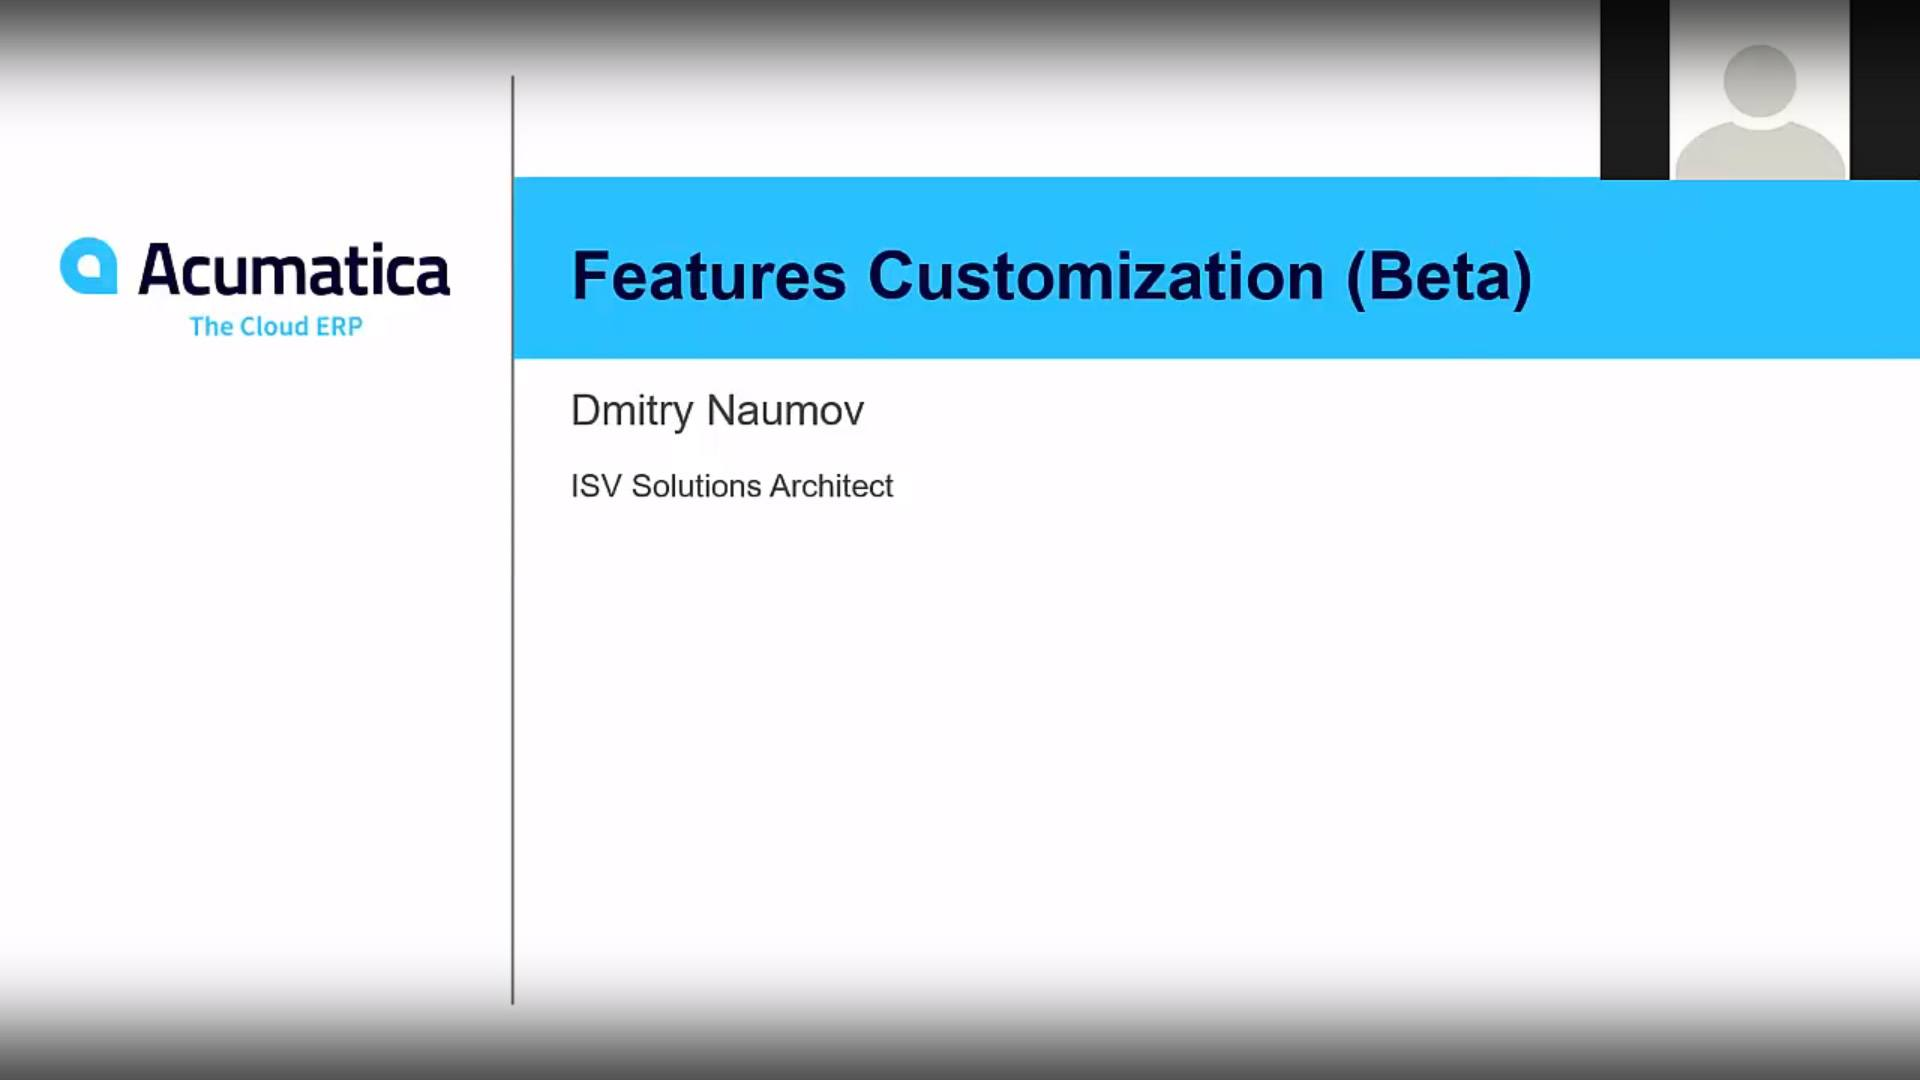 Acumatica Developer Webinar Series: Customization of the Features Set in Acumatica 2019 R1 (For ISVs)